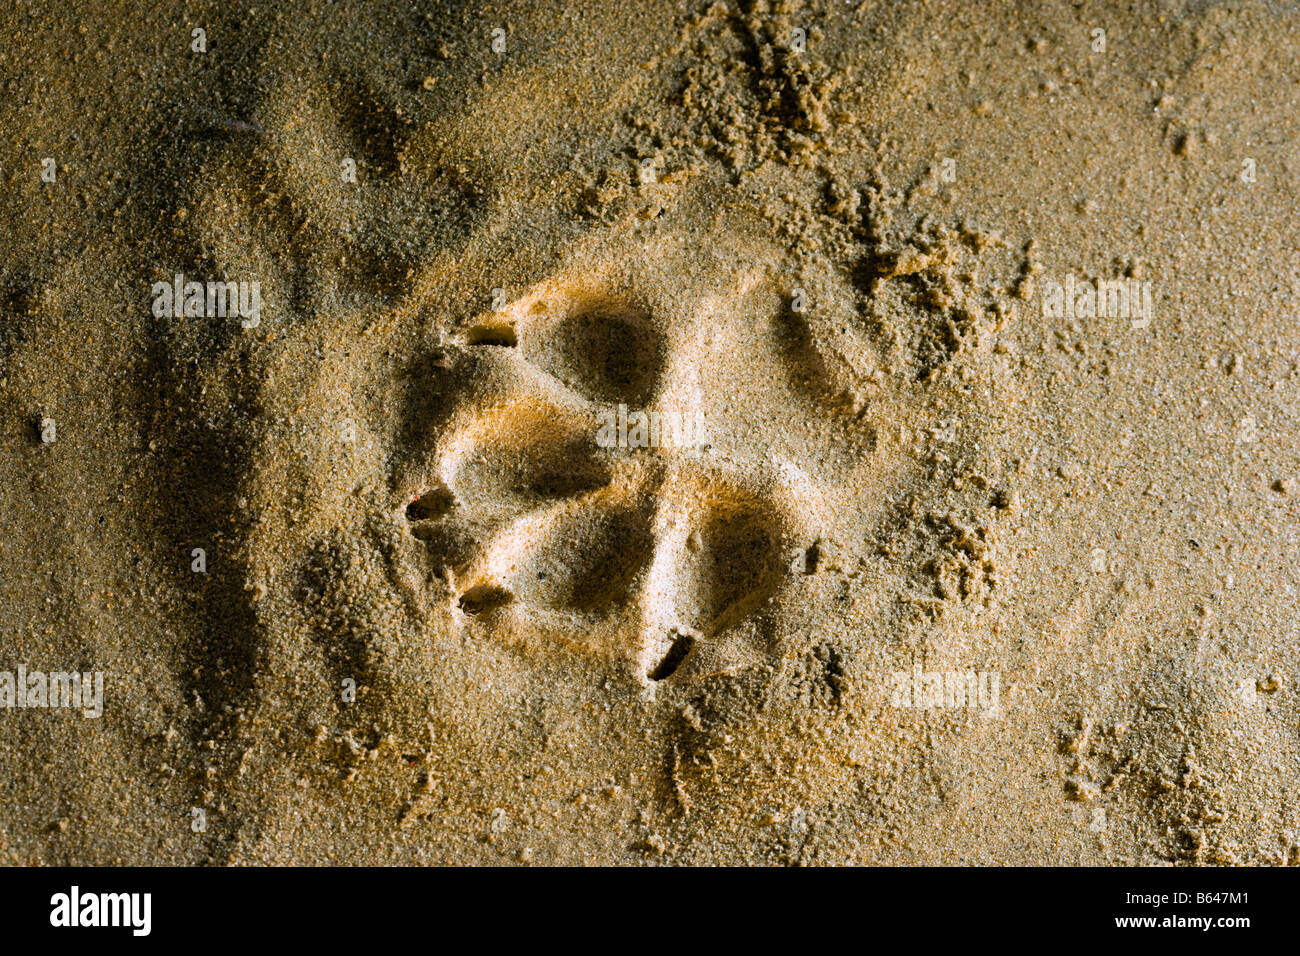 La Finlande, Kuhmo, Petola Centre d'accueil. Informations sur la plus grande des carnivores et preditors. Empreinte Banque D'Images